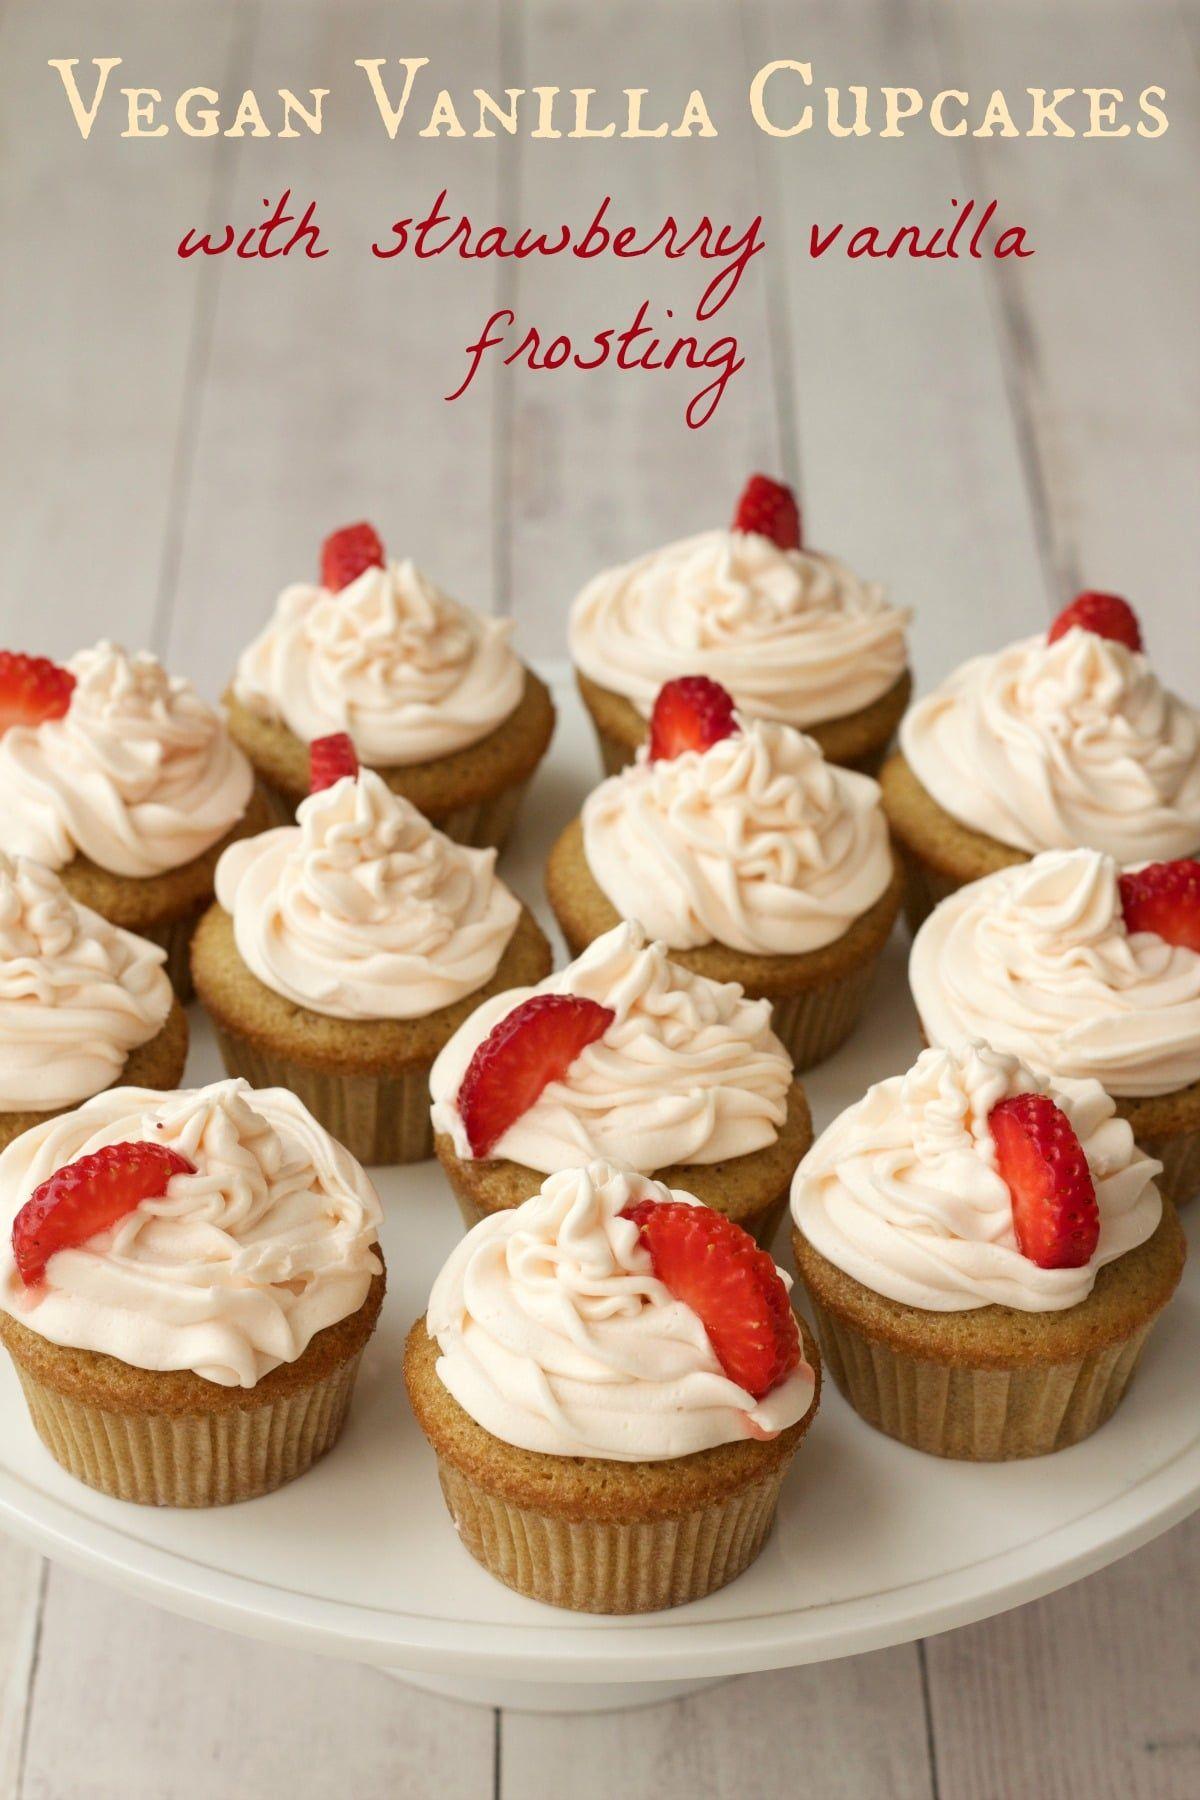 Vegan Vanilla Cupcakes With Strawberry Vanilla Frosting Vegan Lovingitvegan Vanilla Cupcakes Dessert Vegan Vanilla Cupcakes Vegan Bakery Vanilla Cupcakes